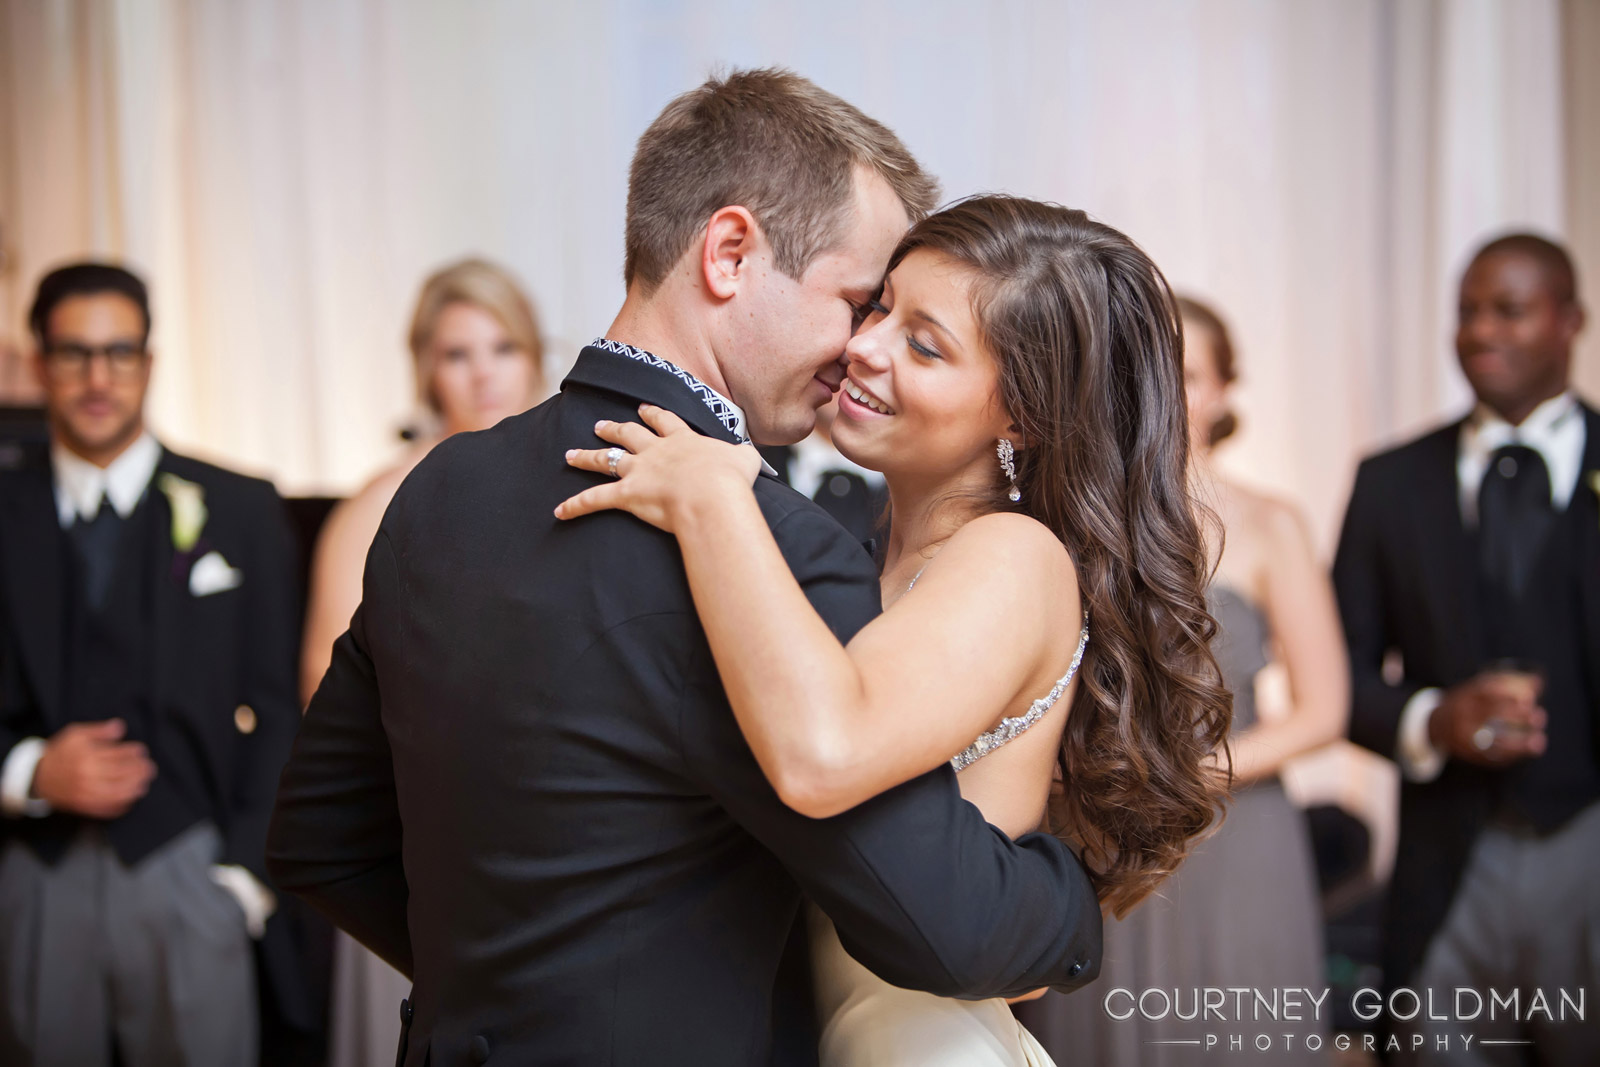 Atlanta-Wedding-Photography-by-Courtney-Goldman-43.jpg